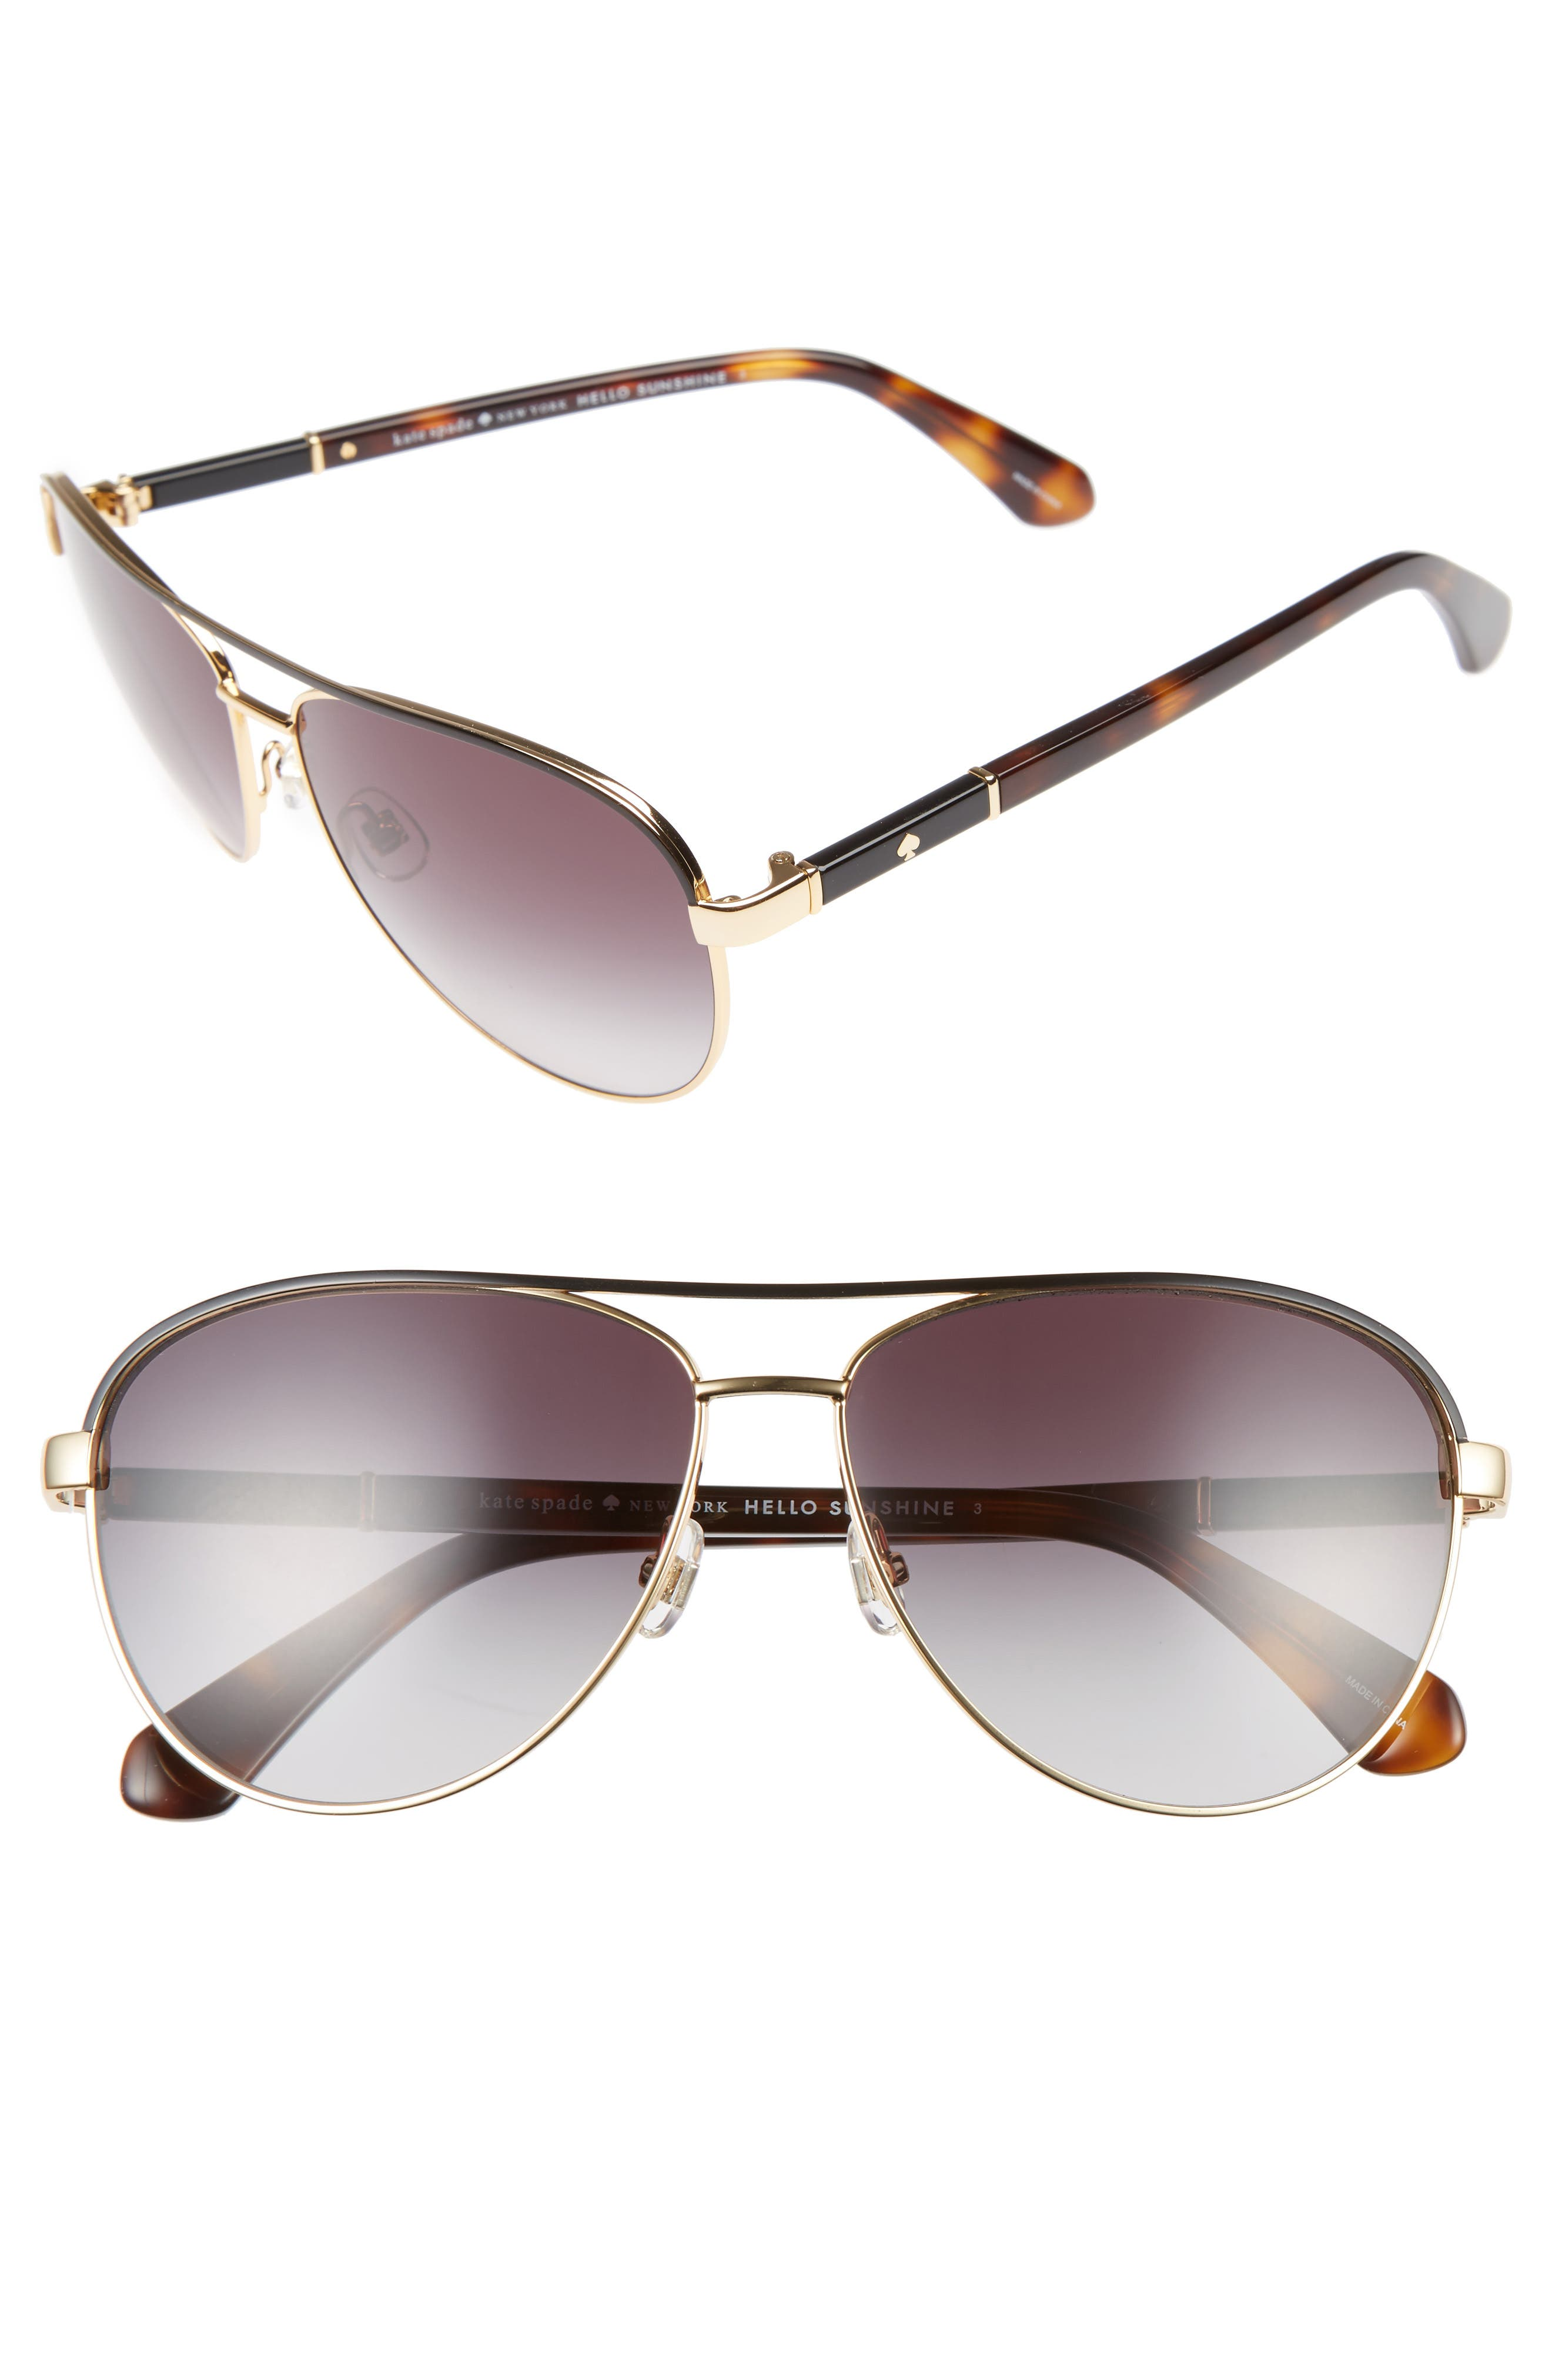 Image of kate spade new york emilys 59mm navigator sunglasses